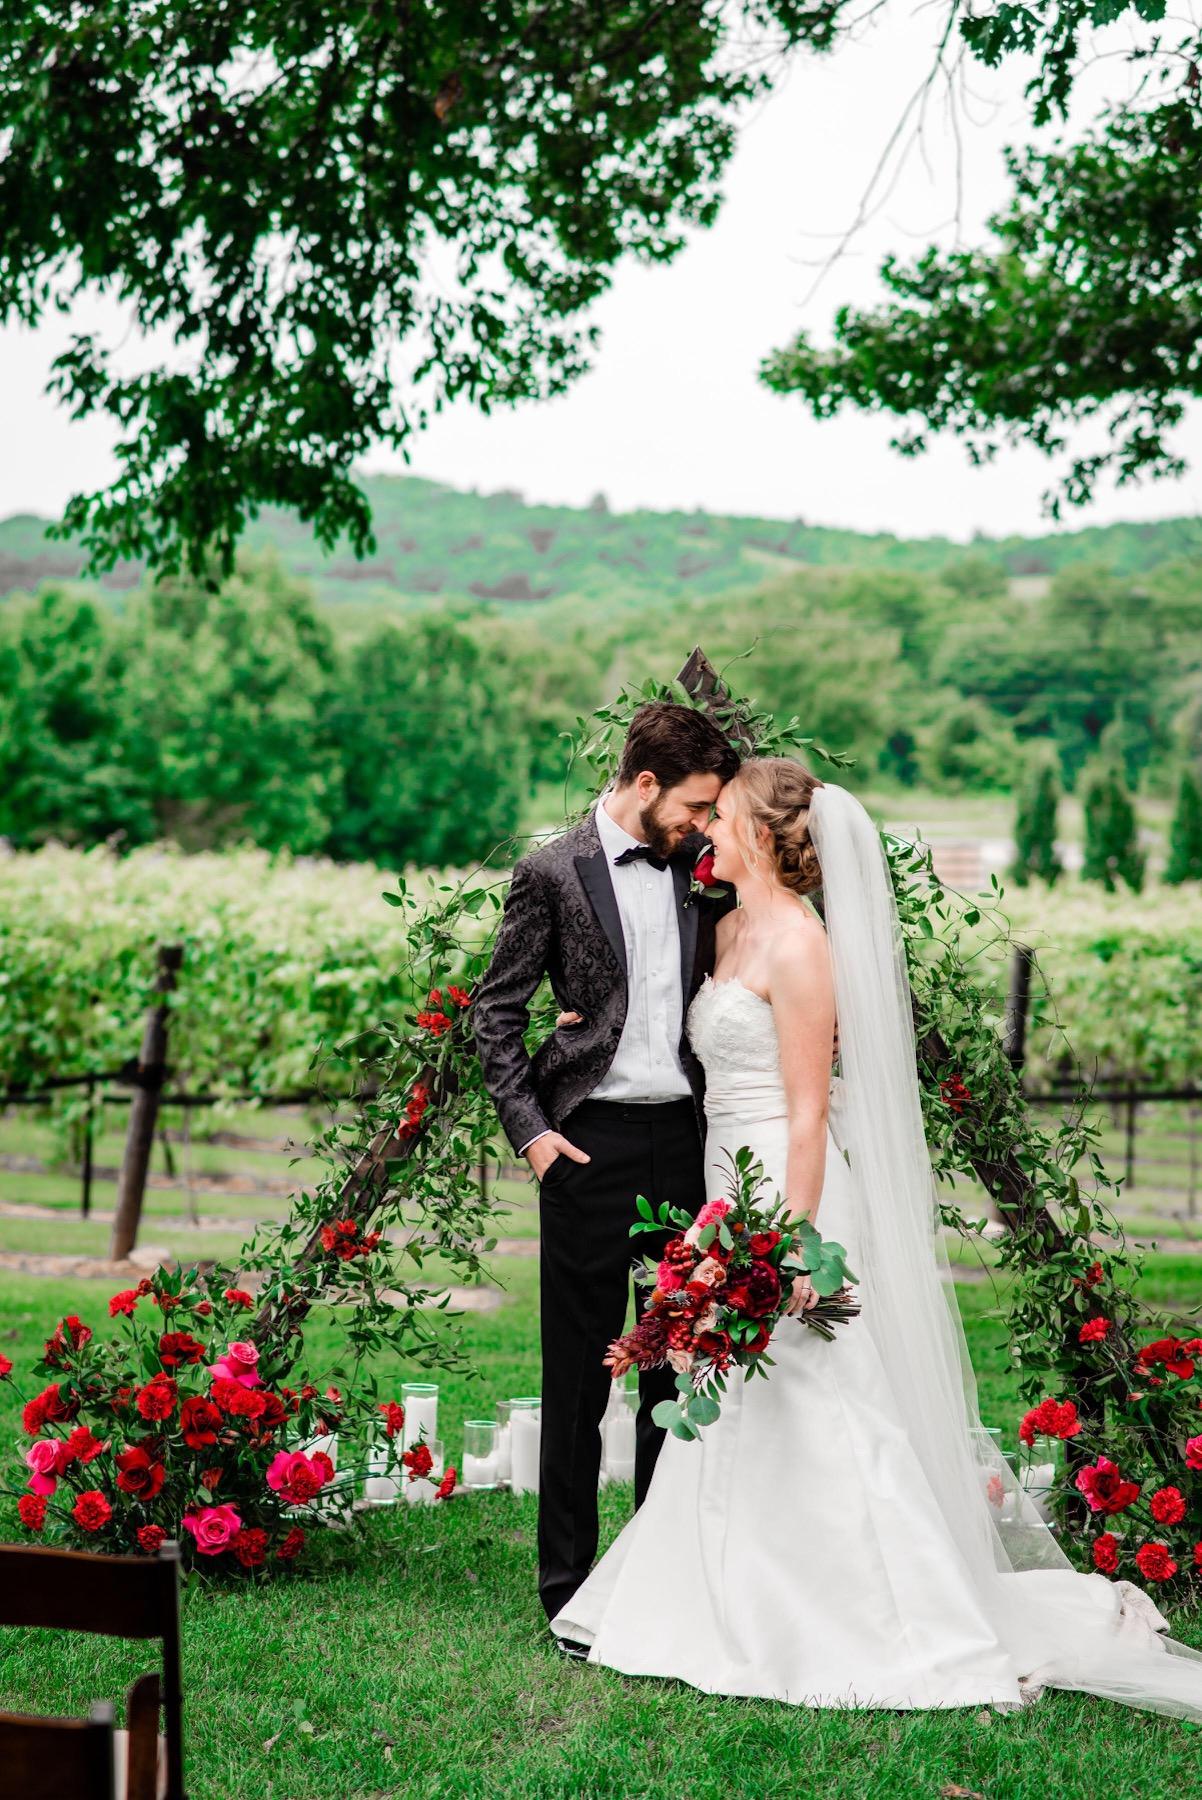 Wedding Ceremony Backdrop Inspiration from Amy & I Designs on Nashville Bride Guide